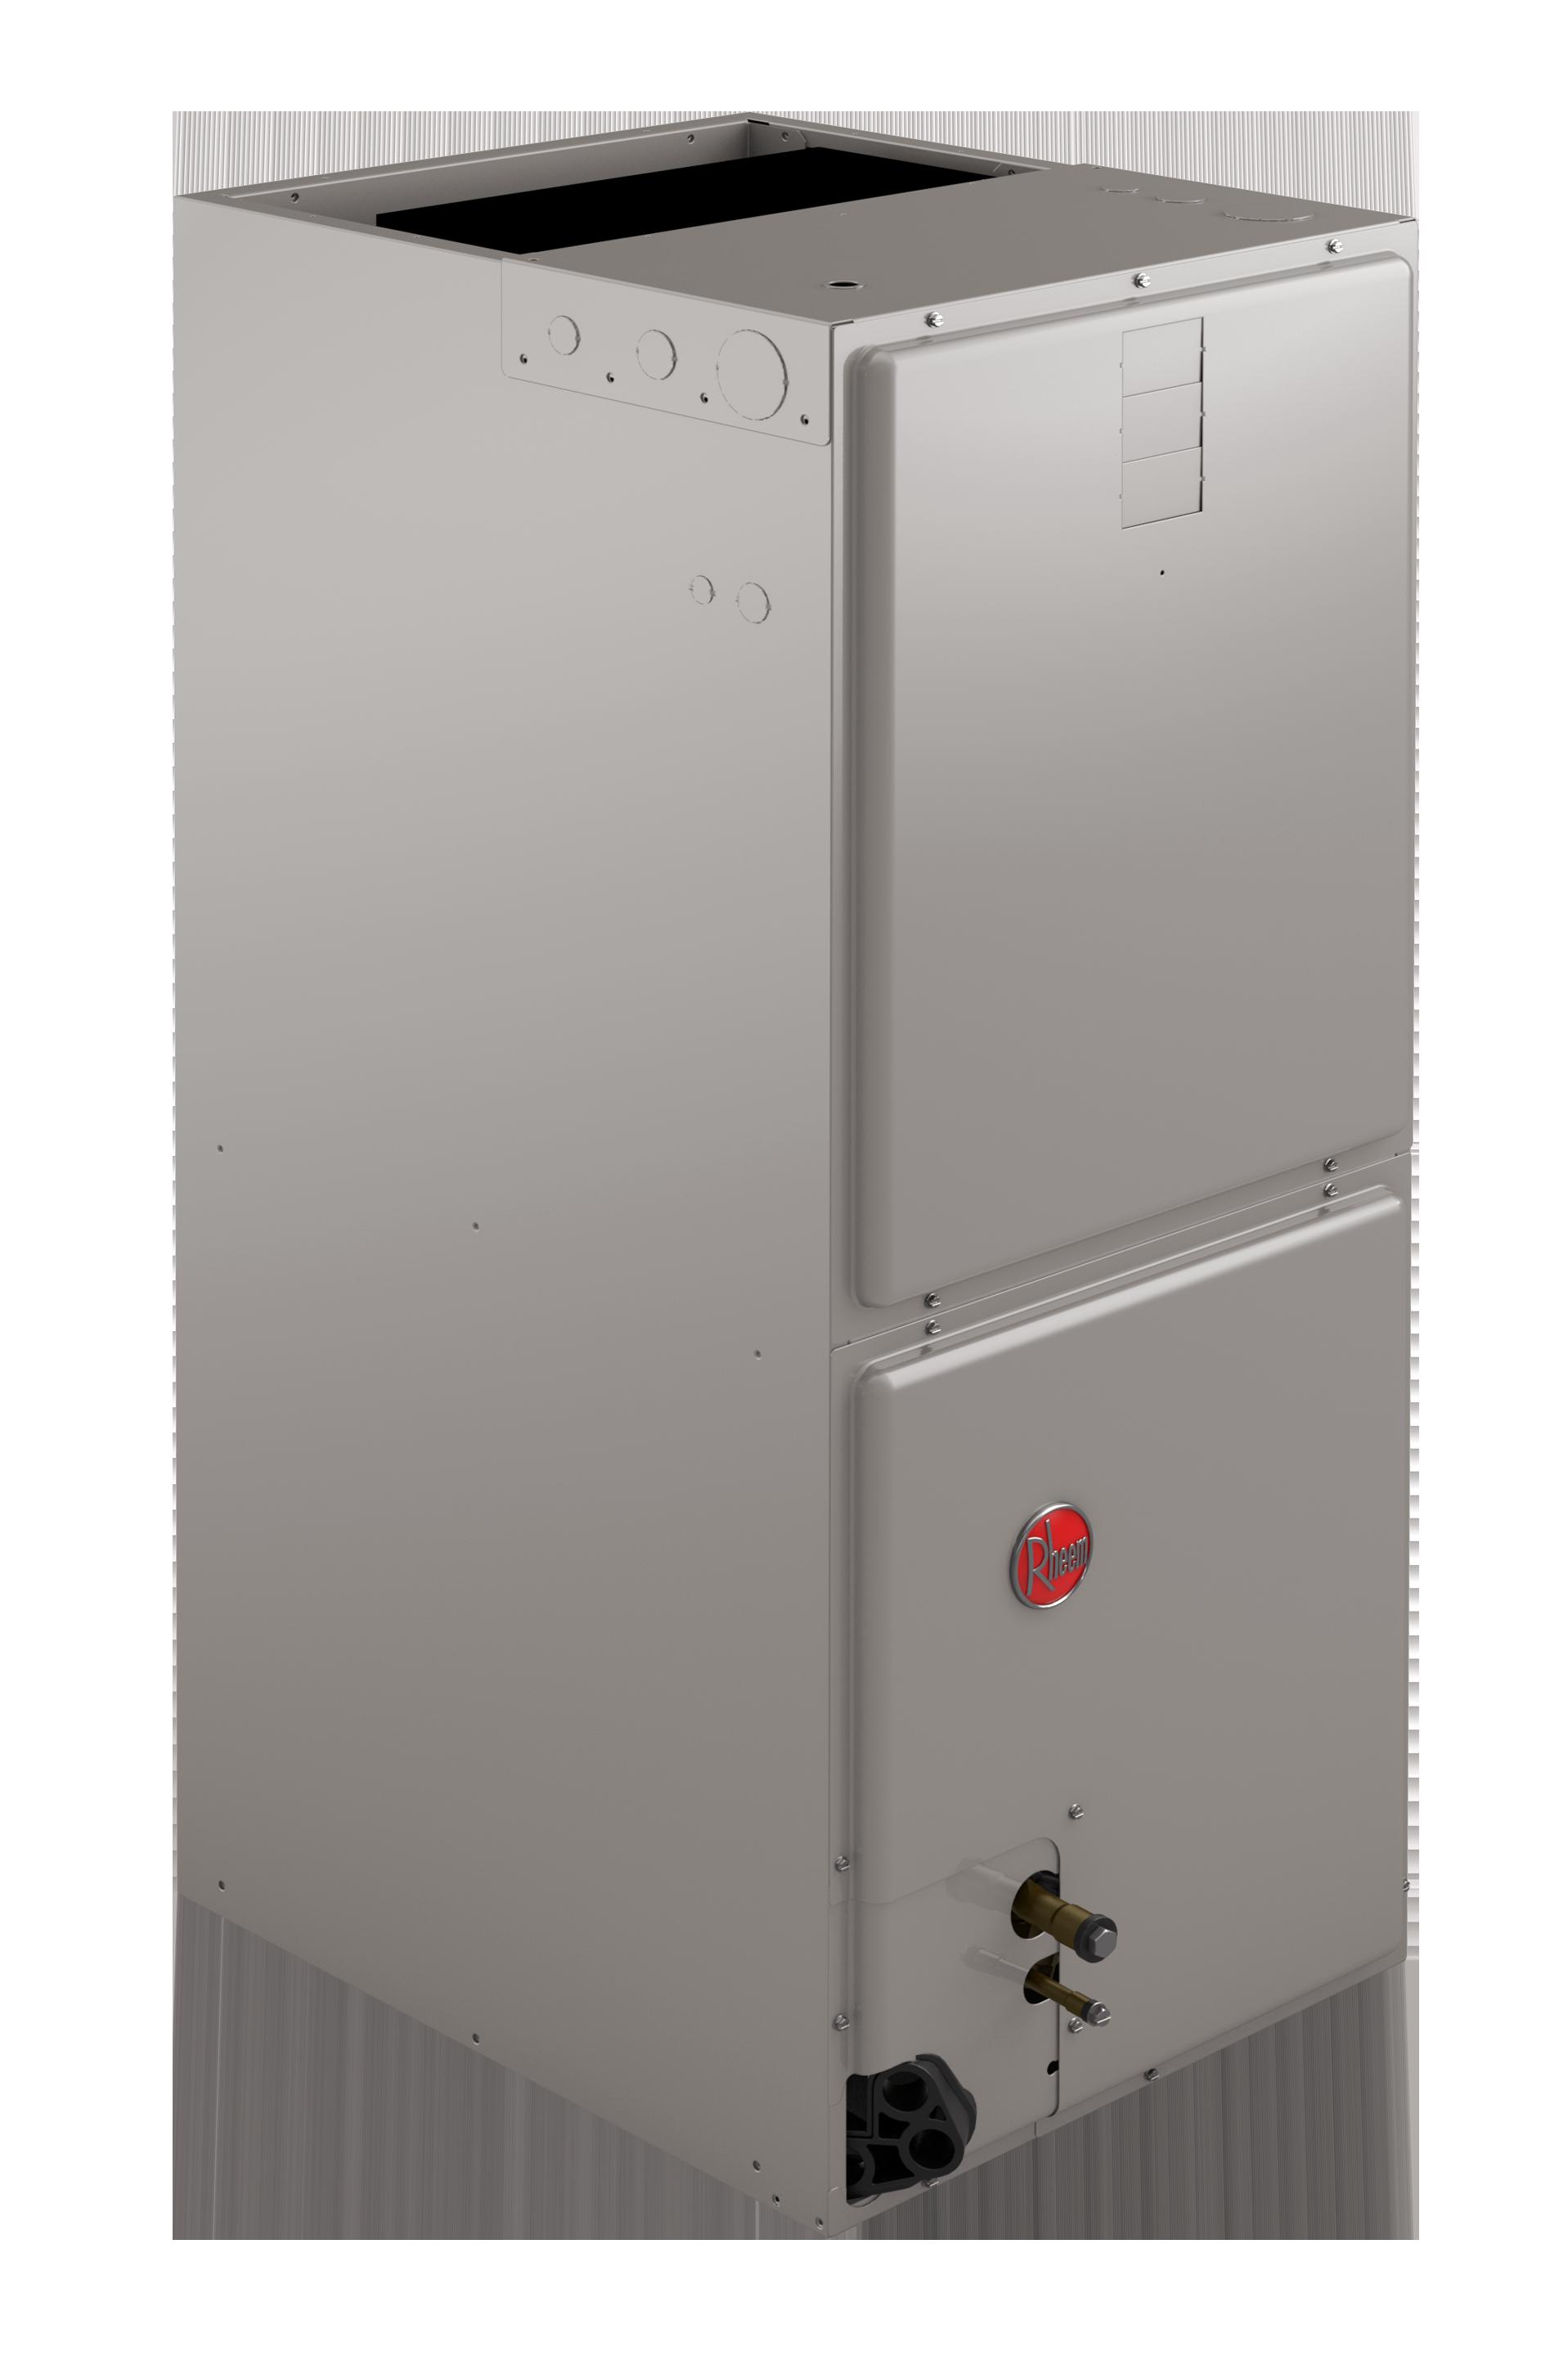 2.0 Ton Rheem RH1T High Efficiency Air Handler